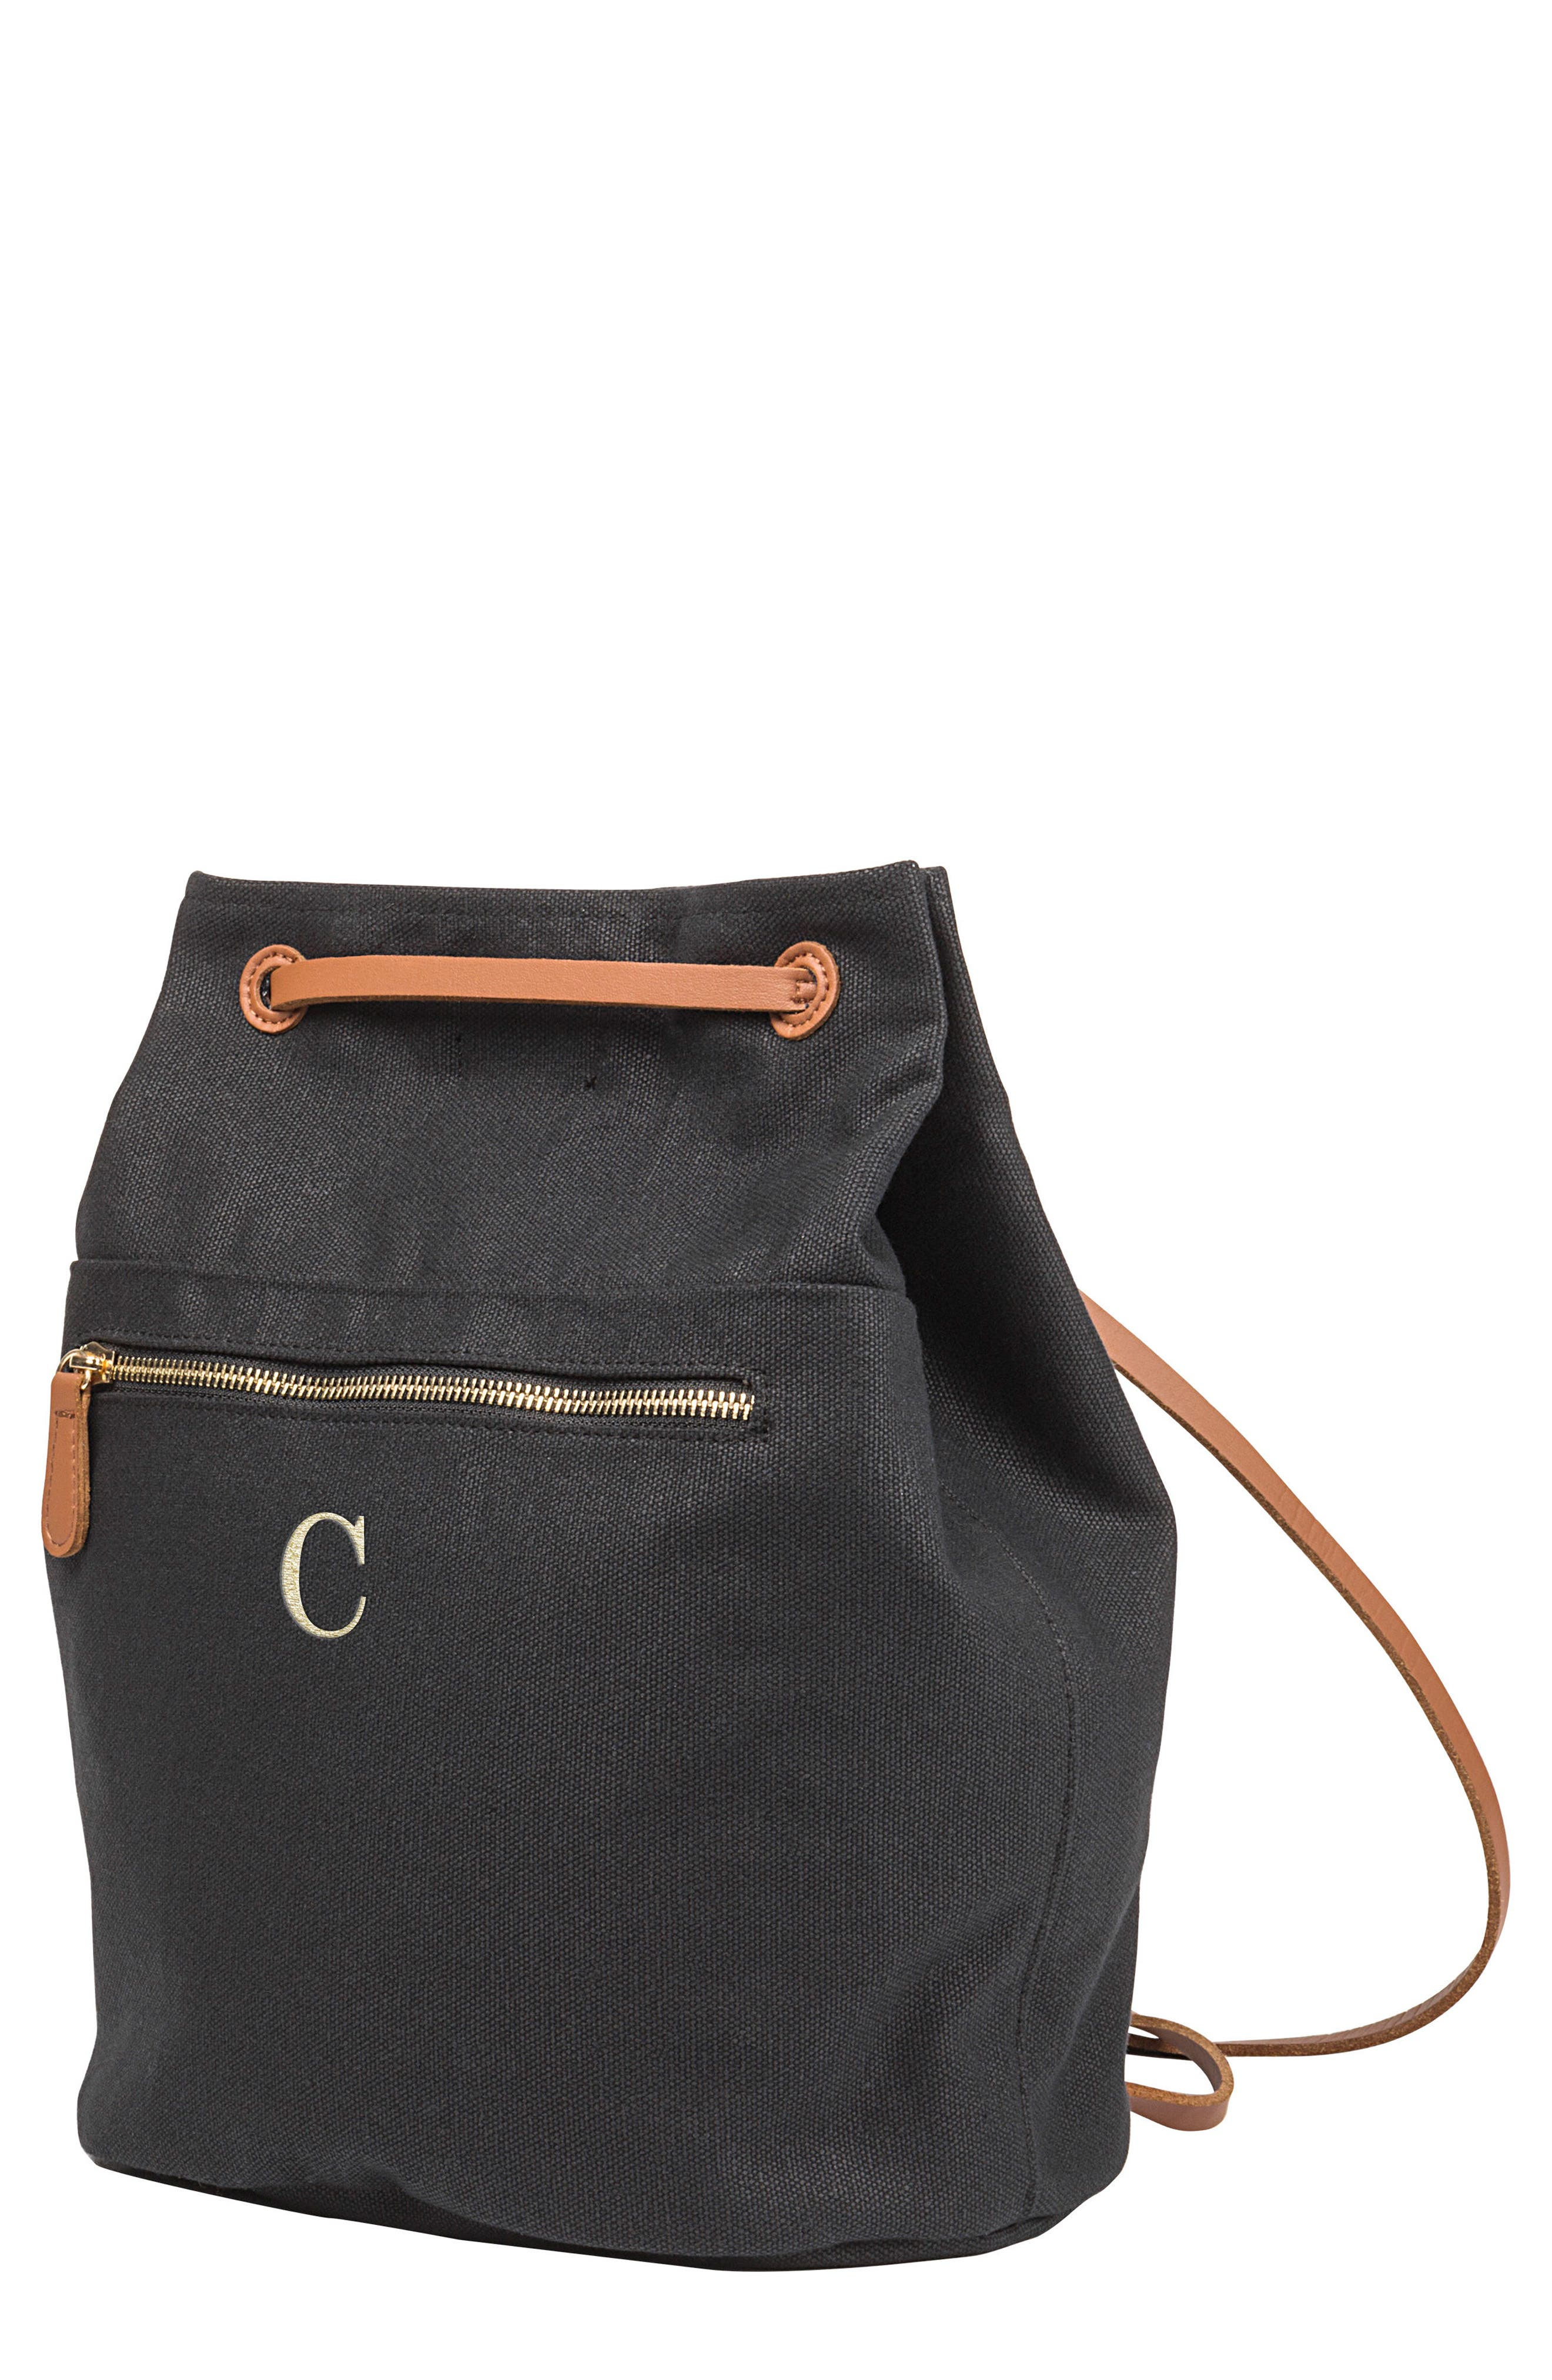 Monogram Convertible Backpack,                             Main thumbnail 4, color,